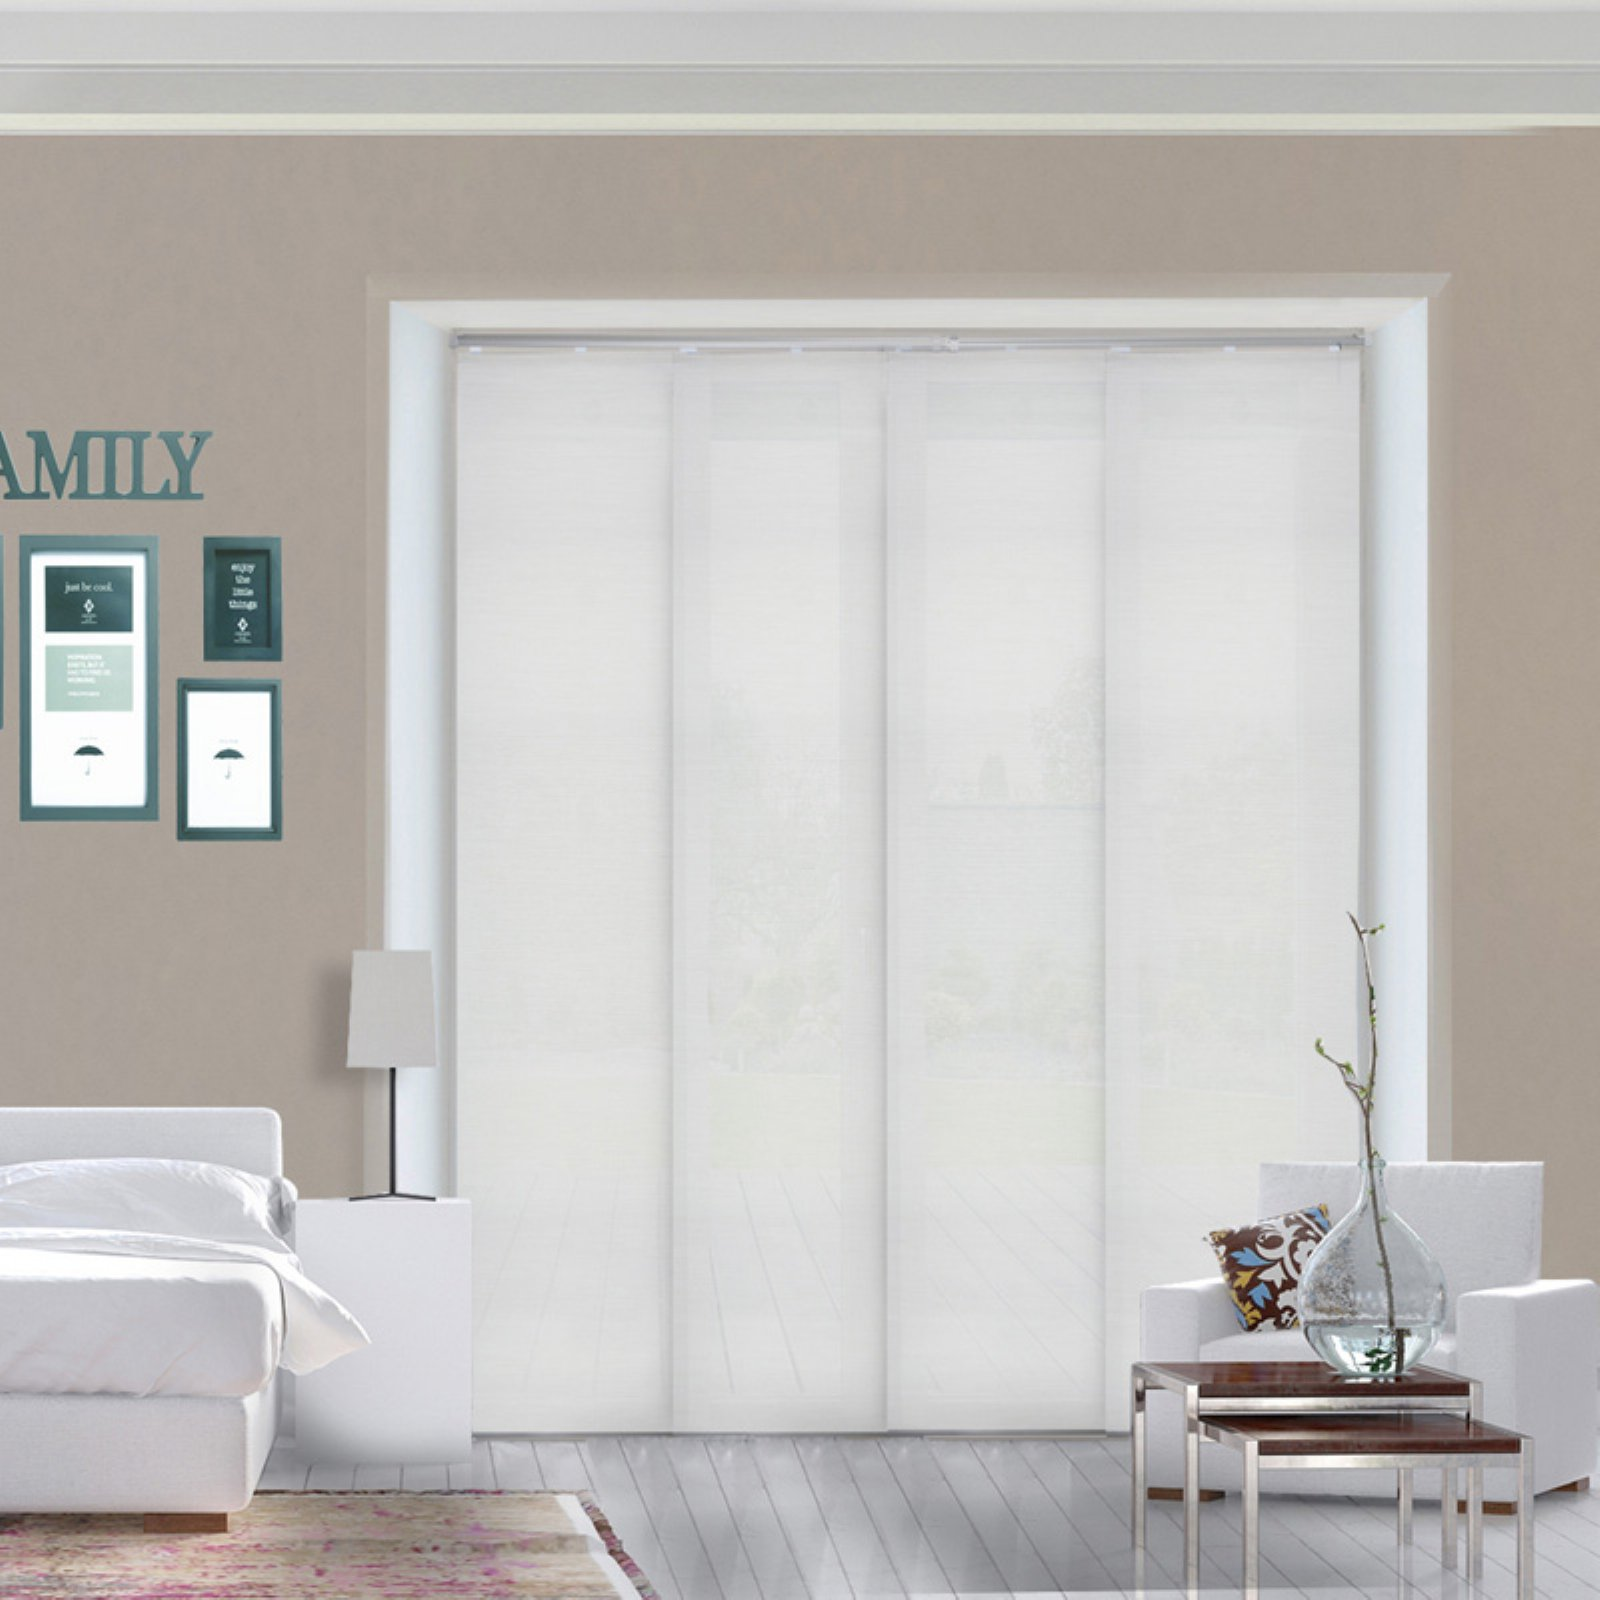 Chicology Adjustable Sliding Window Panel Daily White Blinds